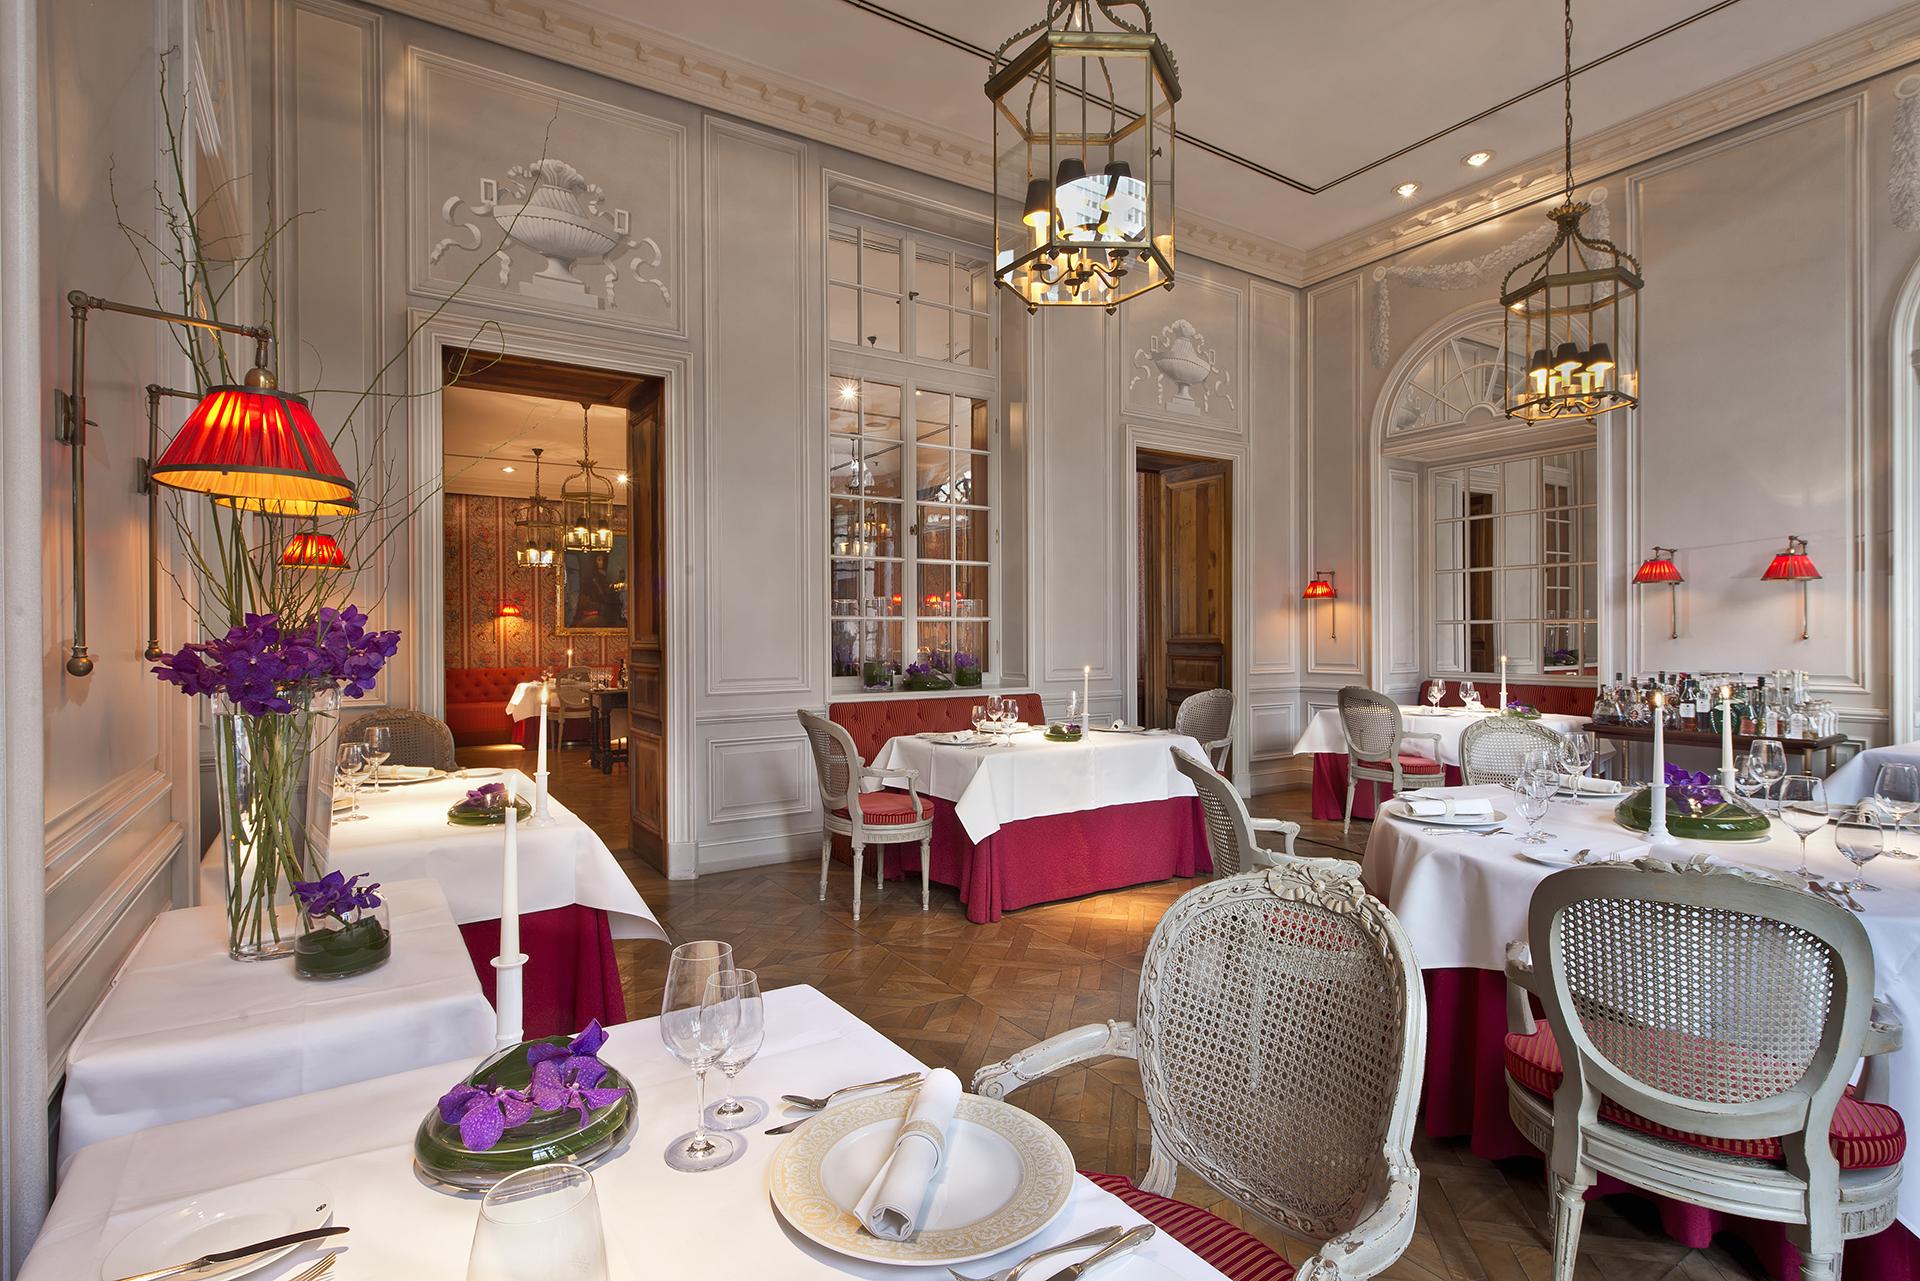 Restaurant Français at Frankfurter Hof Steigenberger - best restaurants in frankfurt